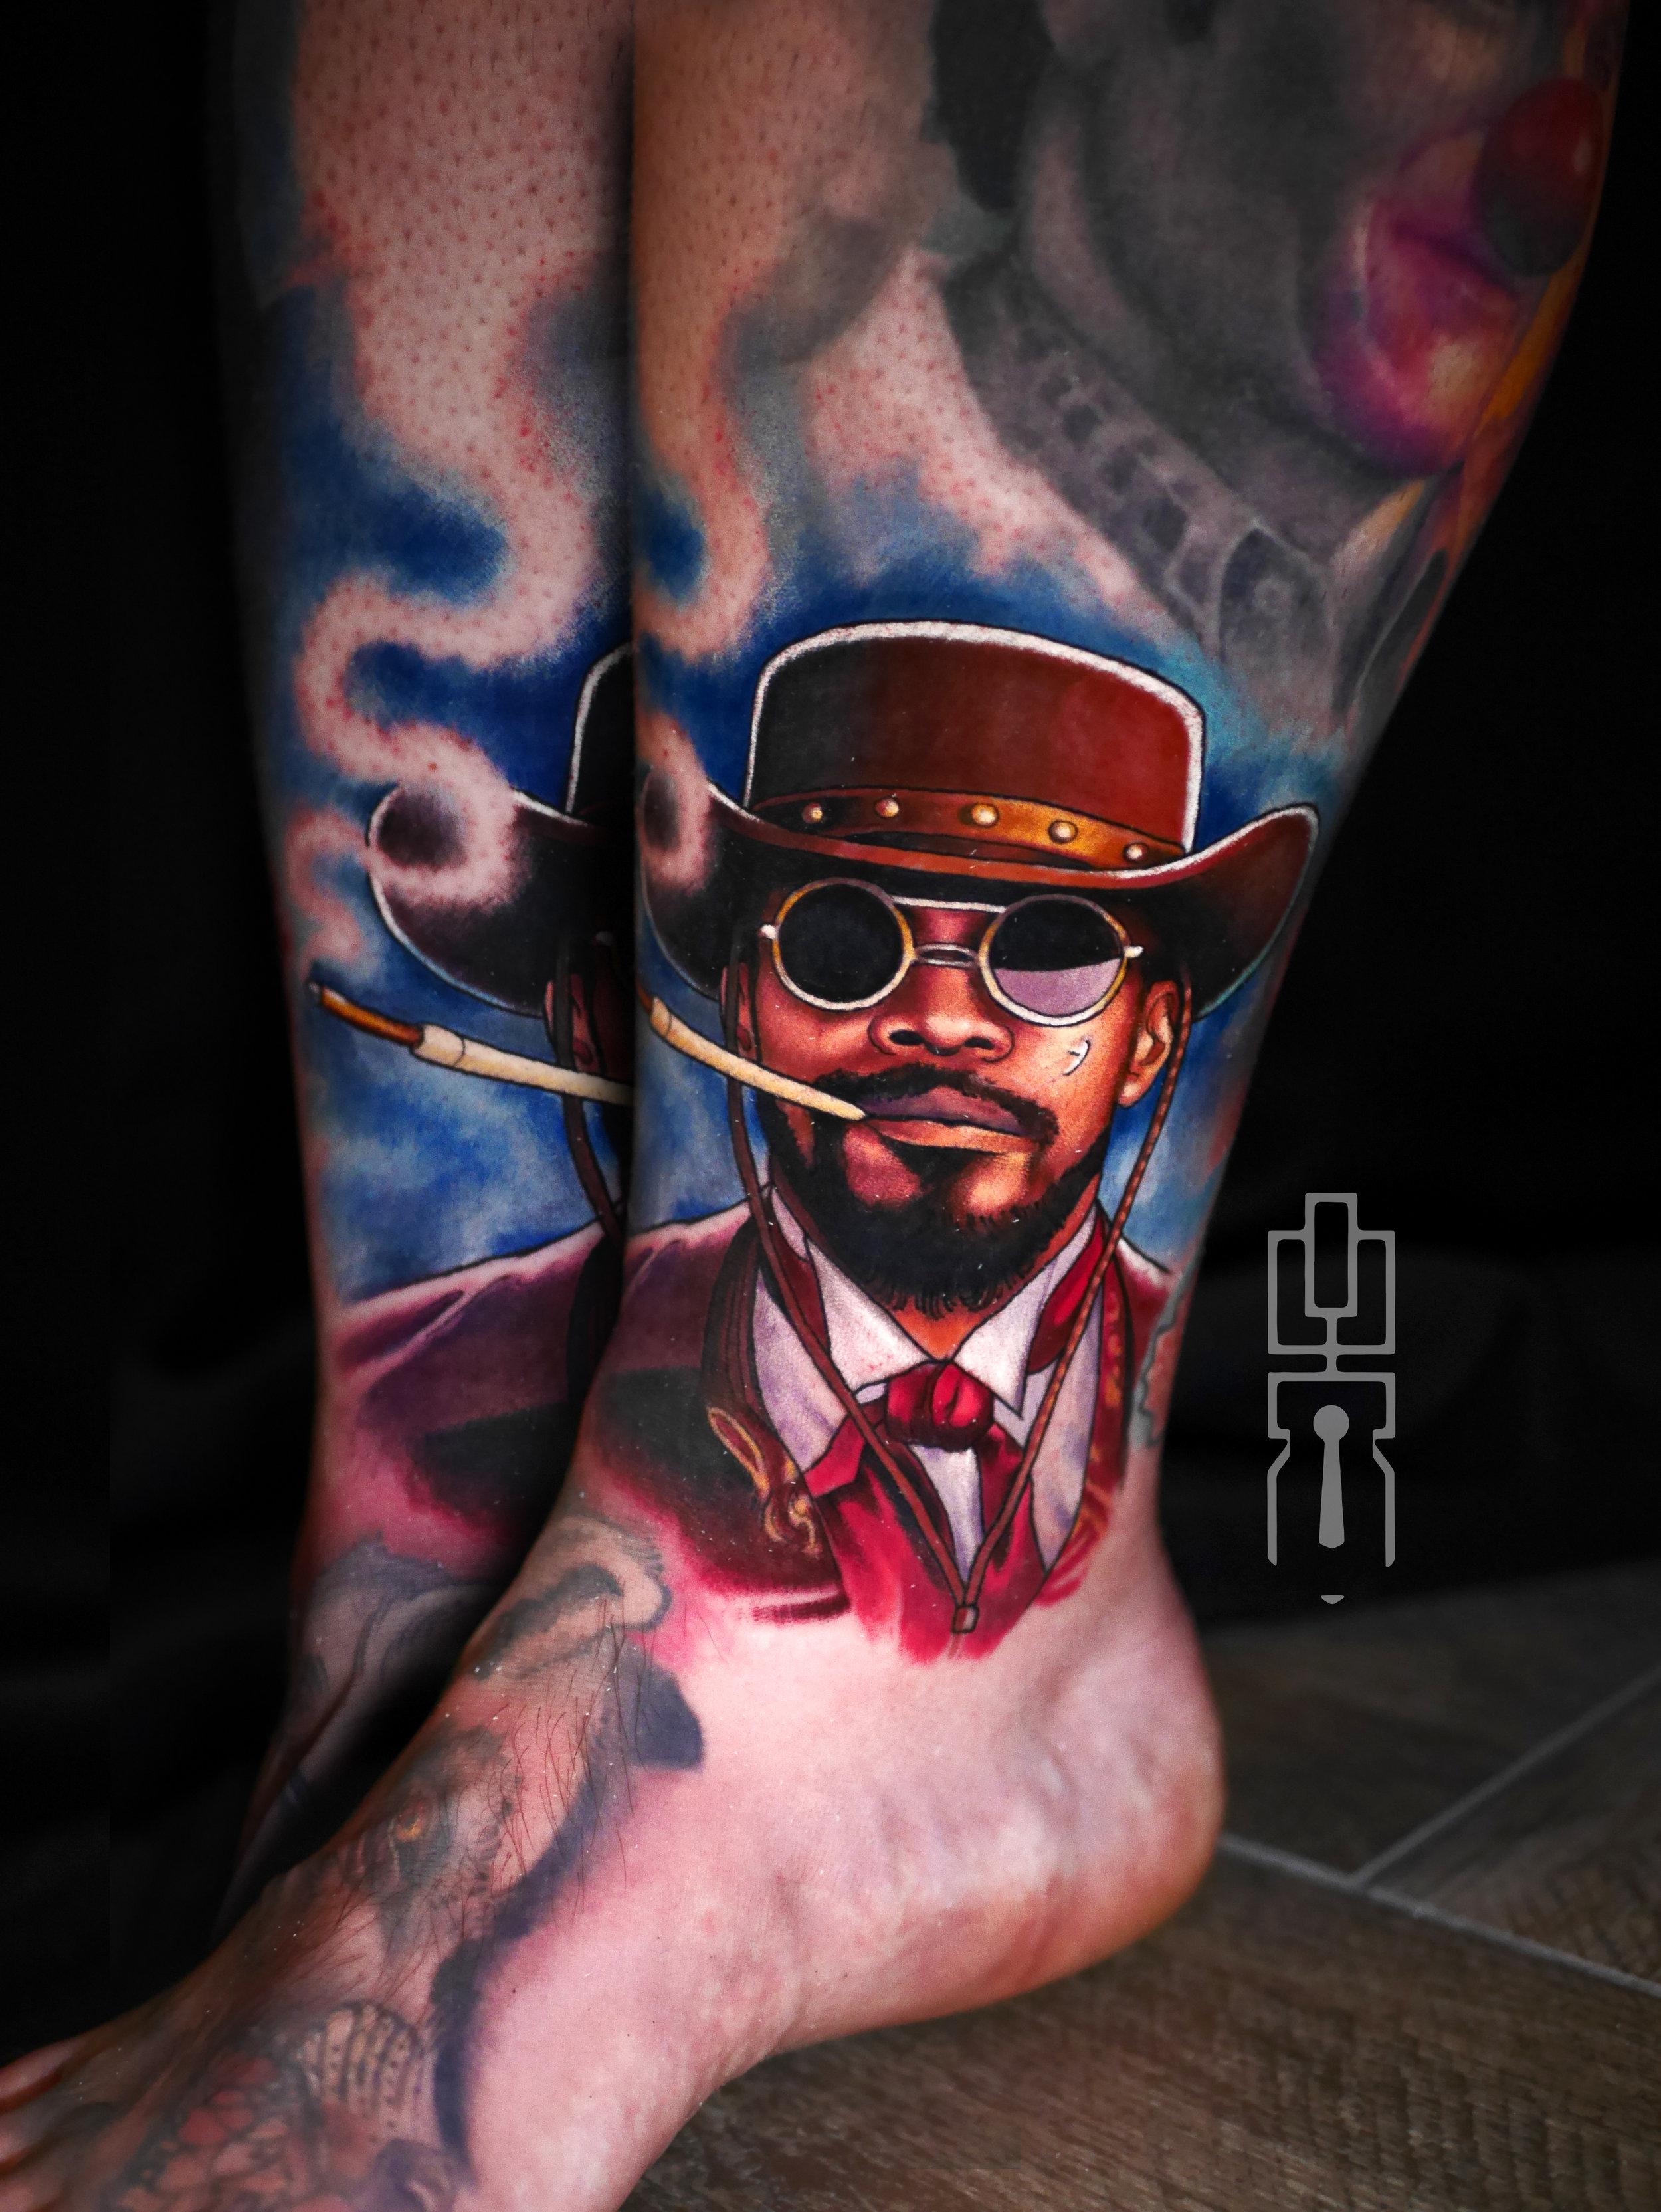 django unchained jamie foxx tattoo.jpg